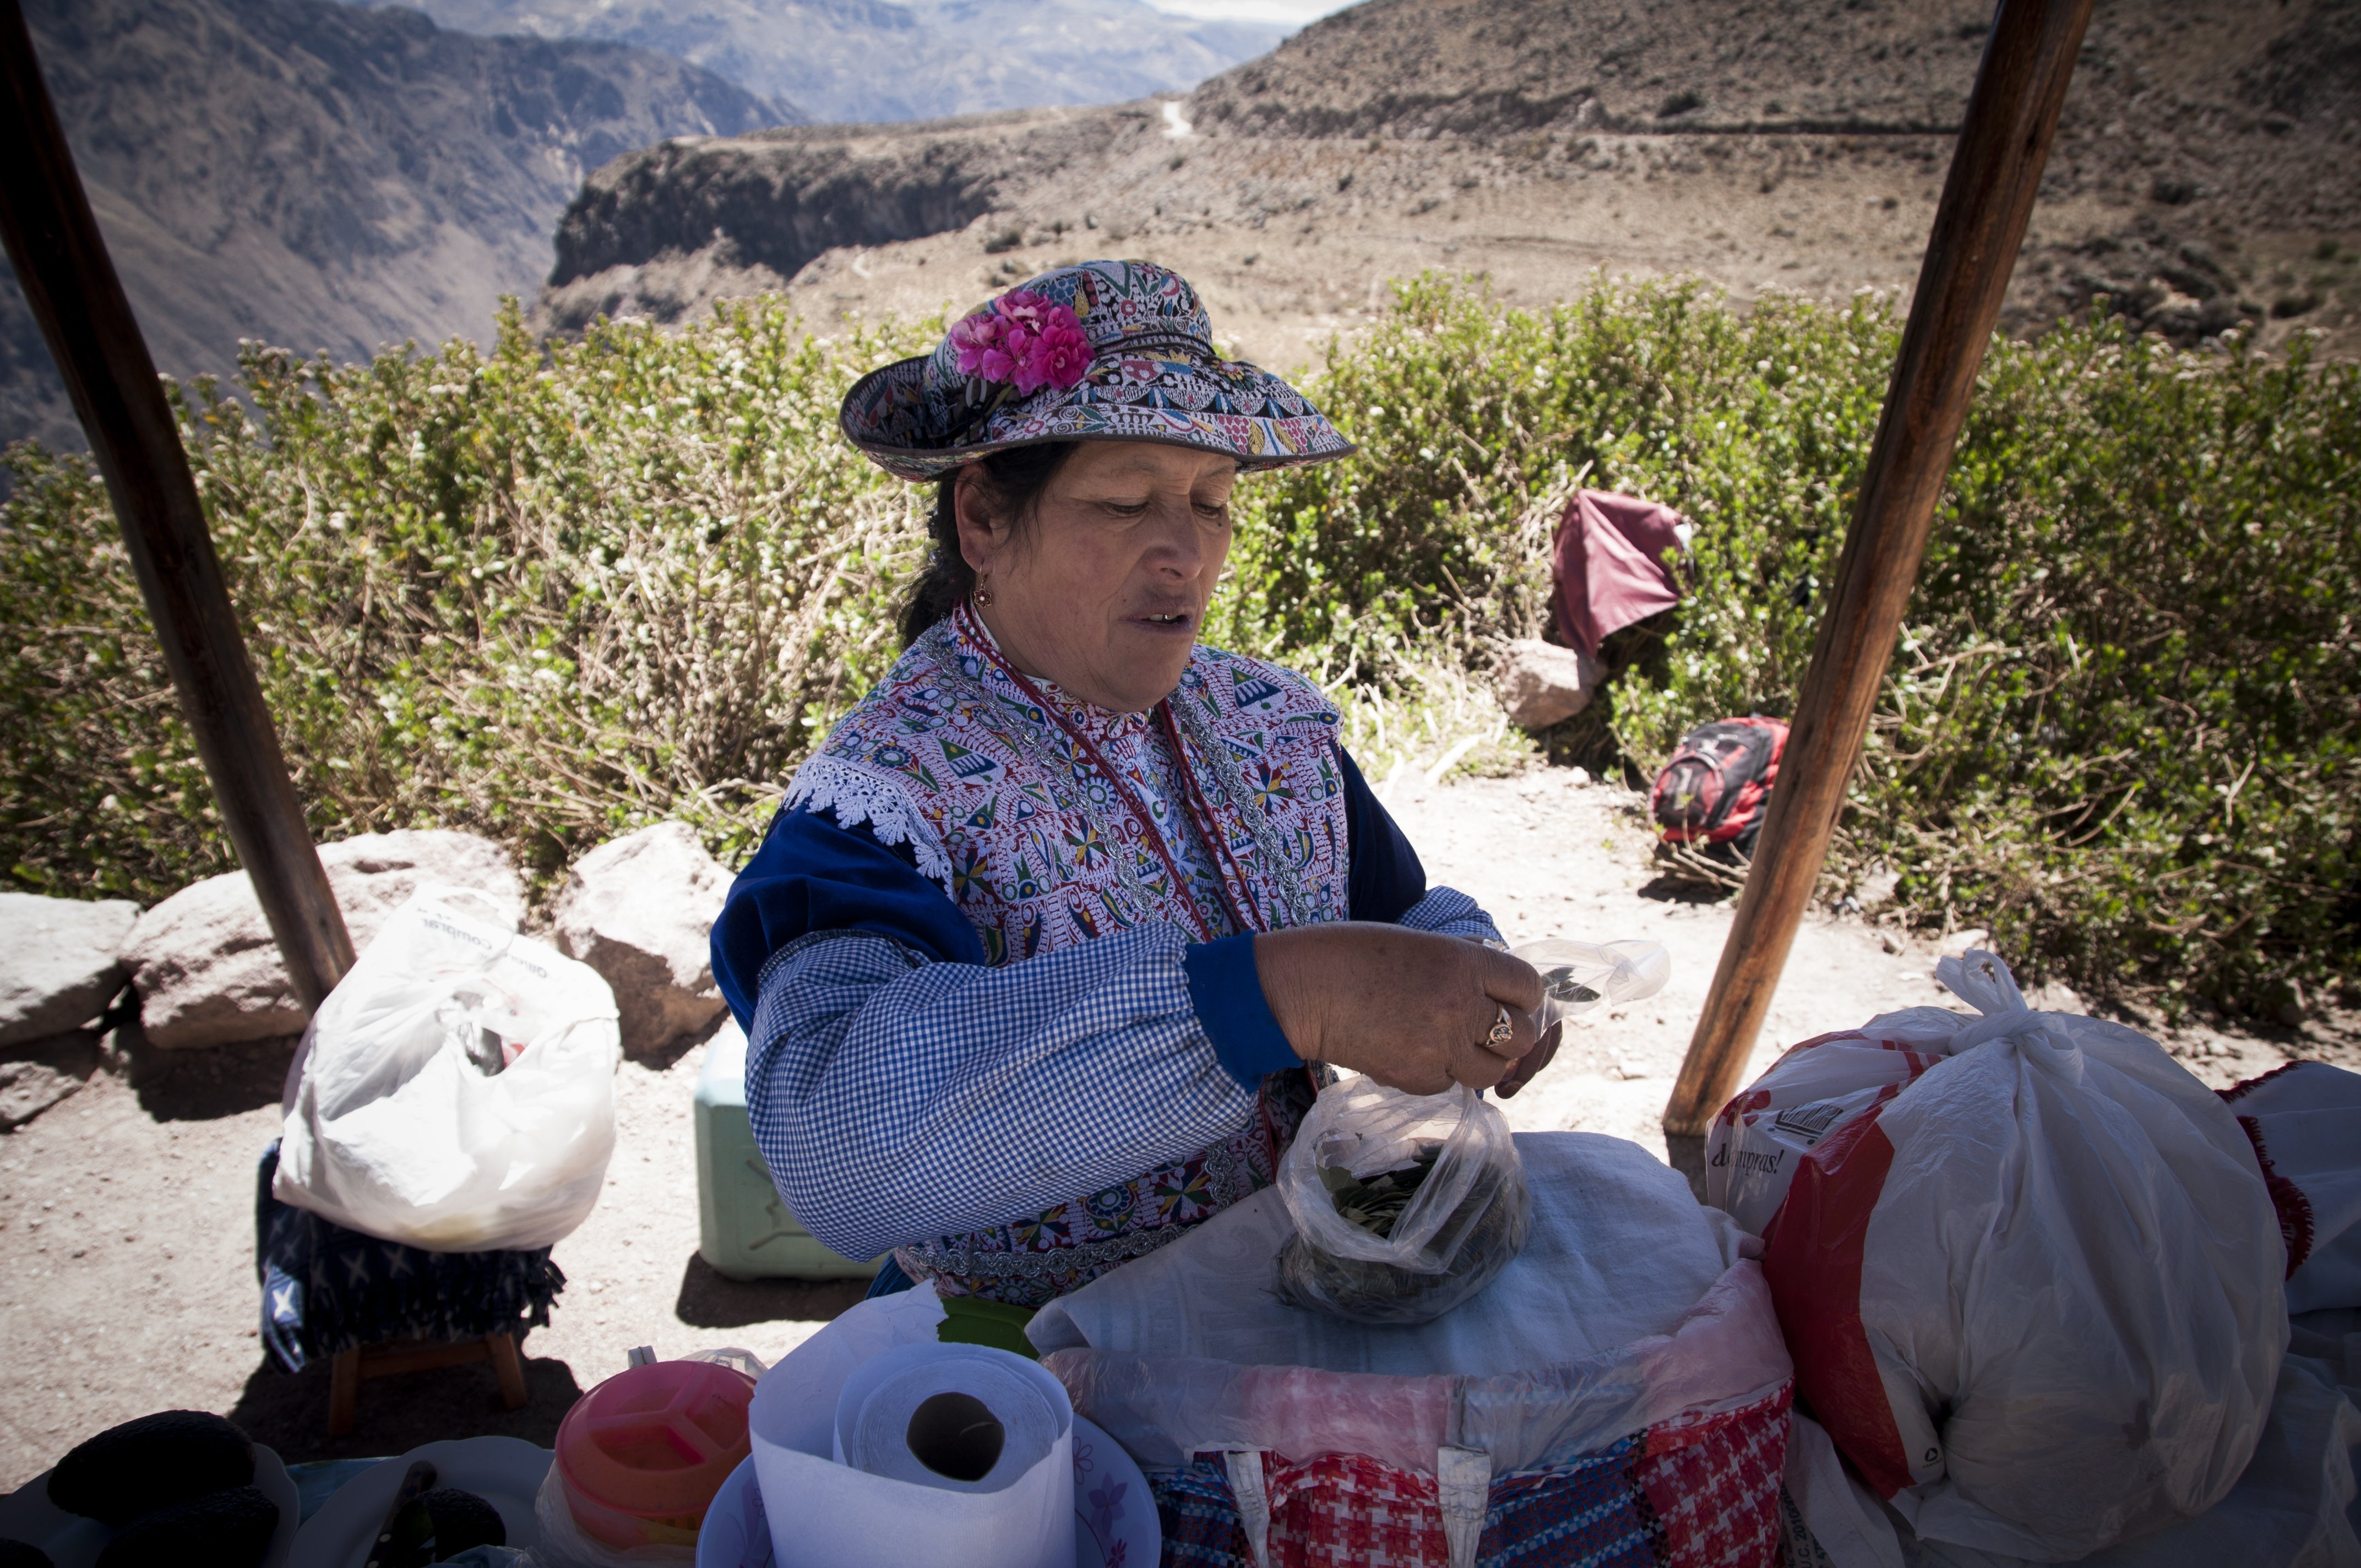 Peru 2013 Cañon del Colca Mirador del condor4